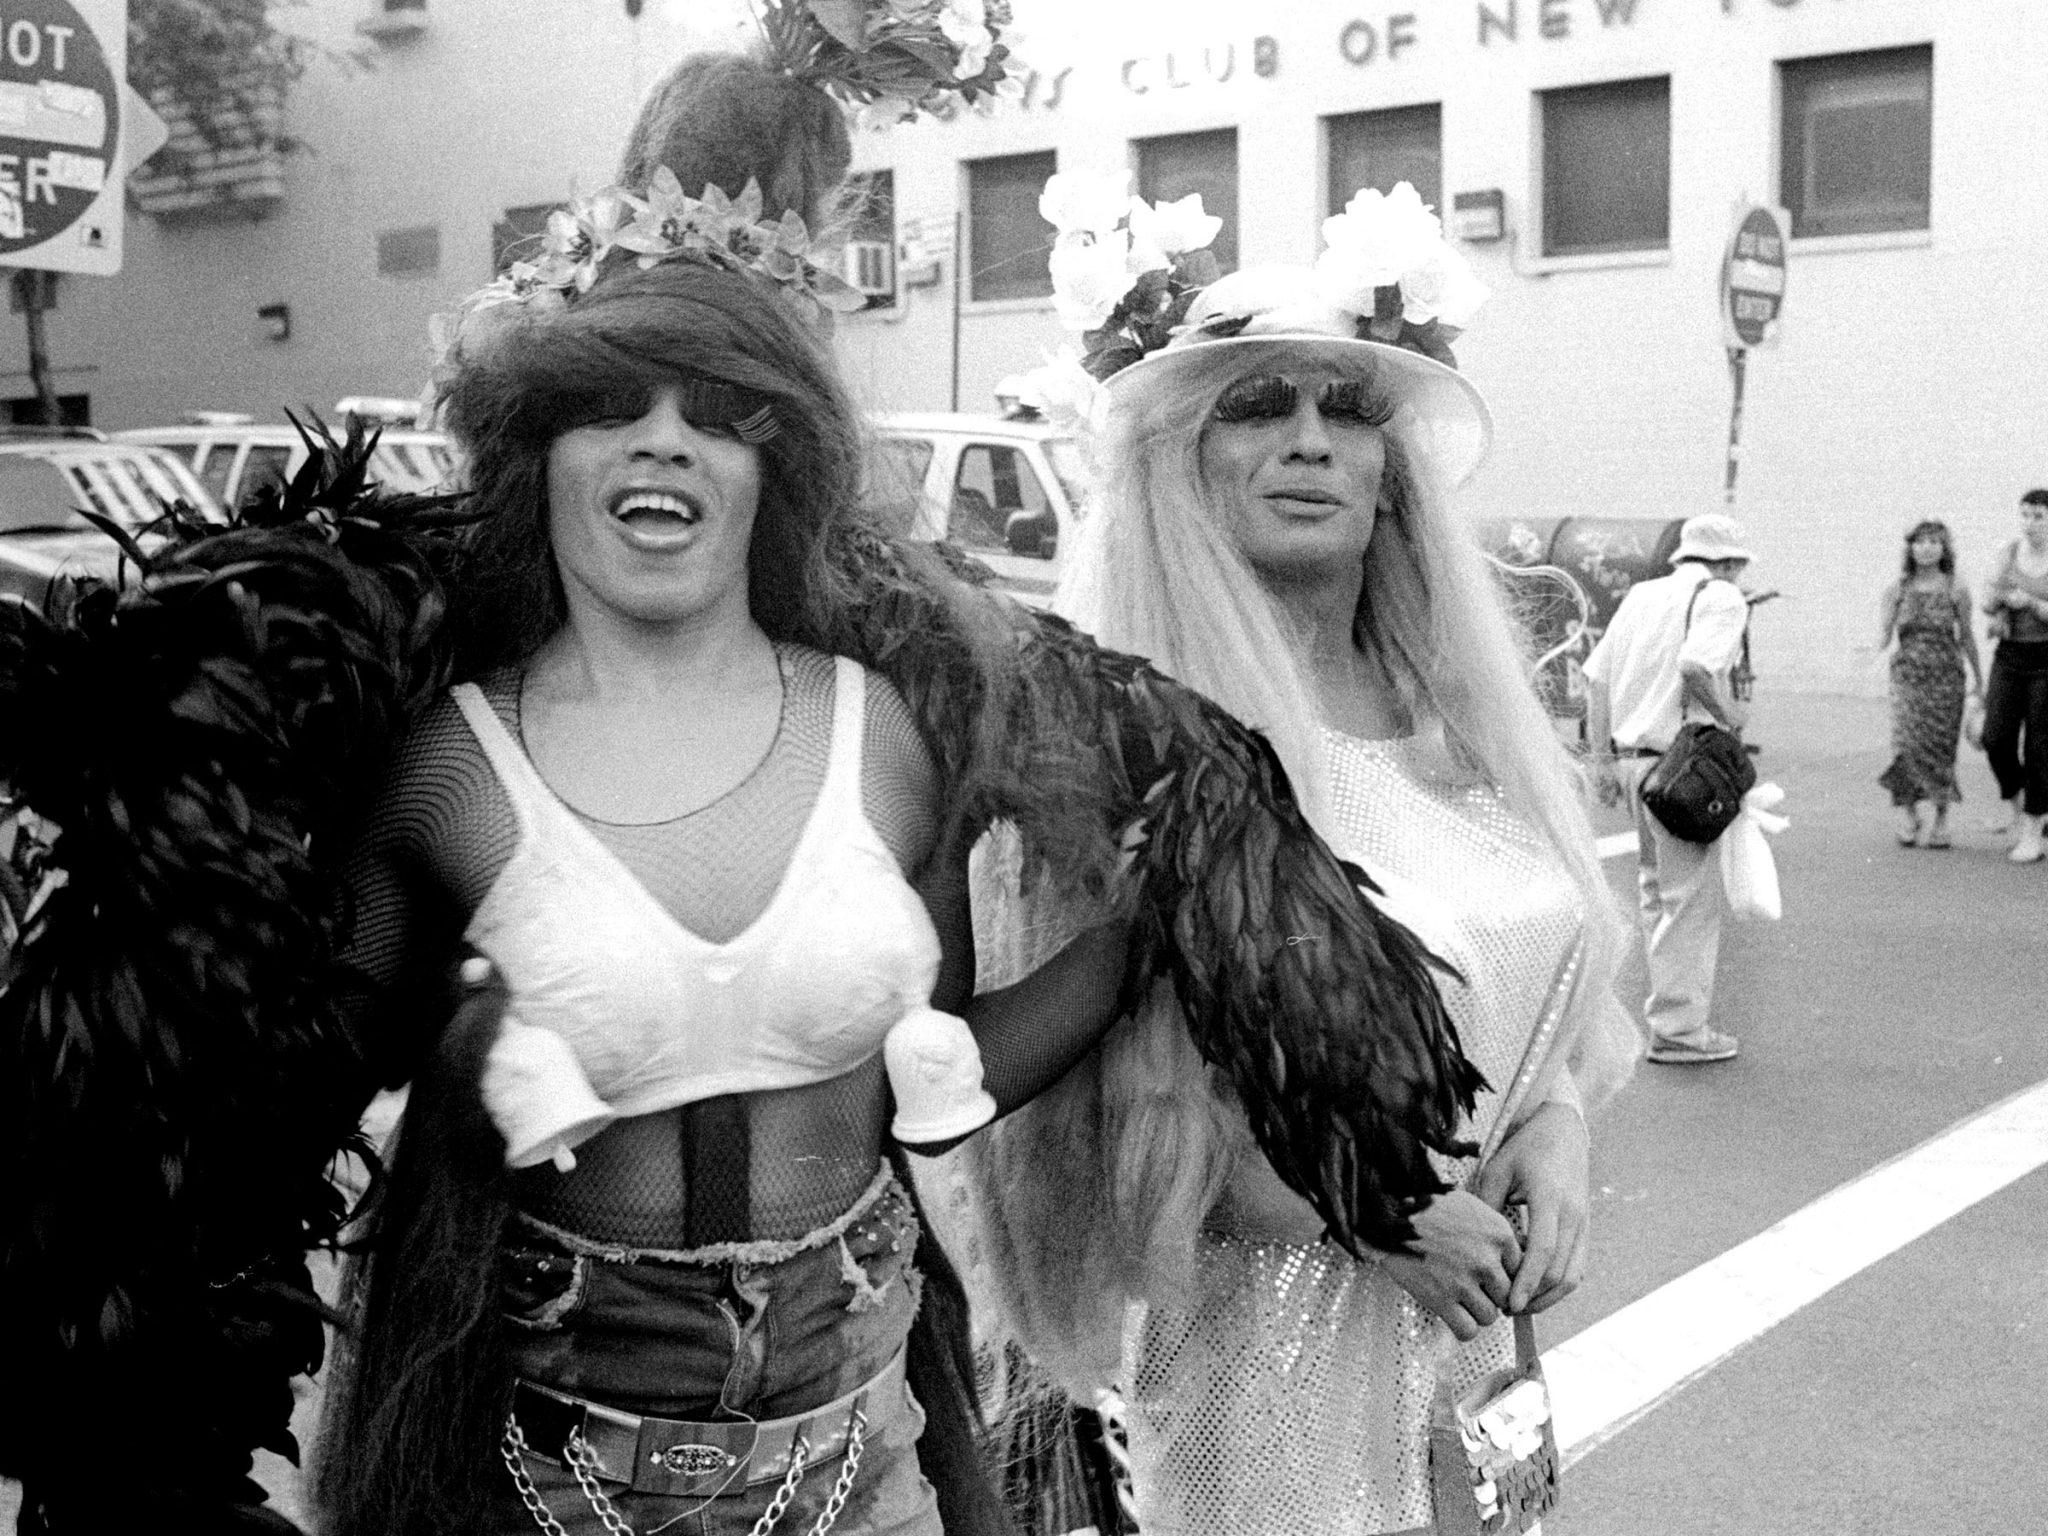 WIGSTOCK 2013, PRIDE, LGBTQ, transgender, drag queentranssexual,